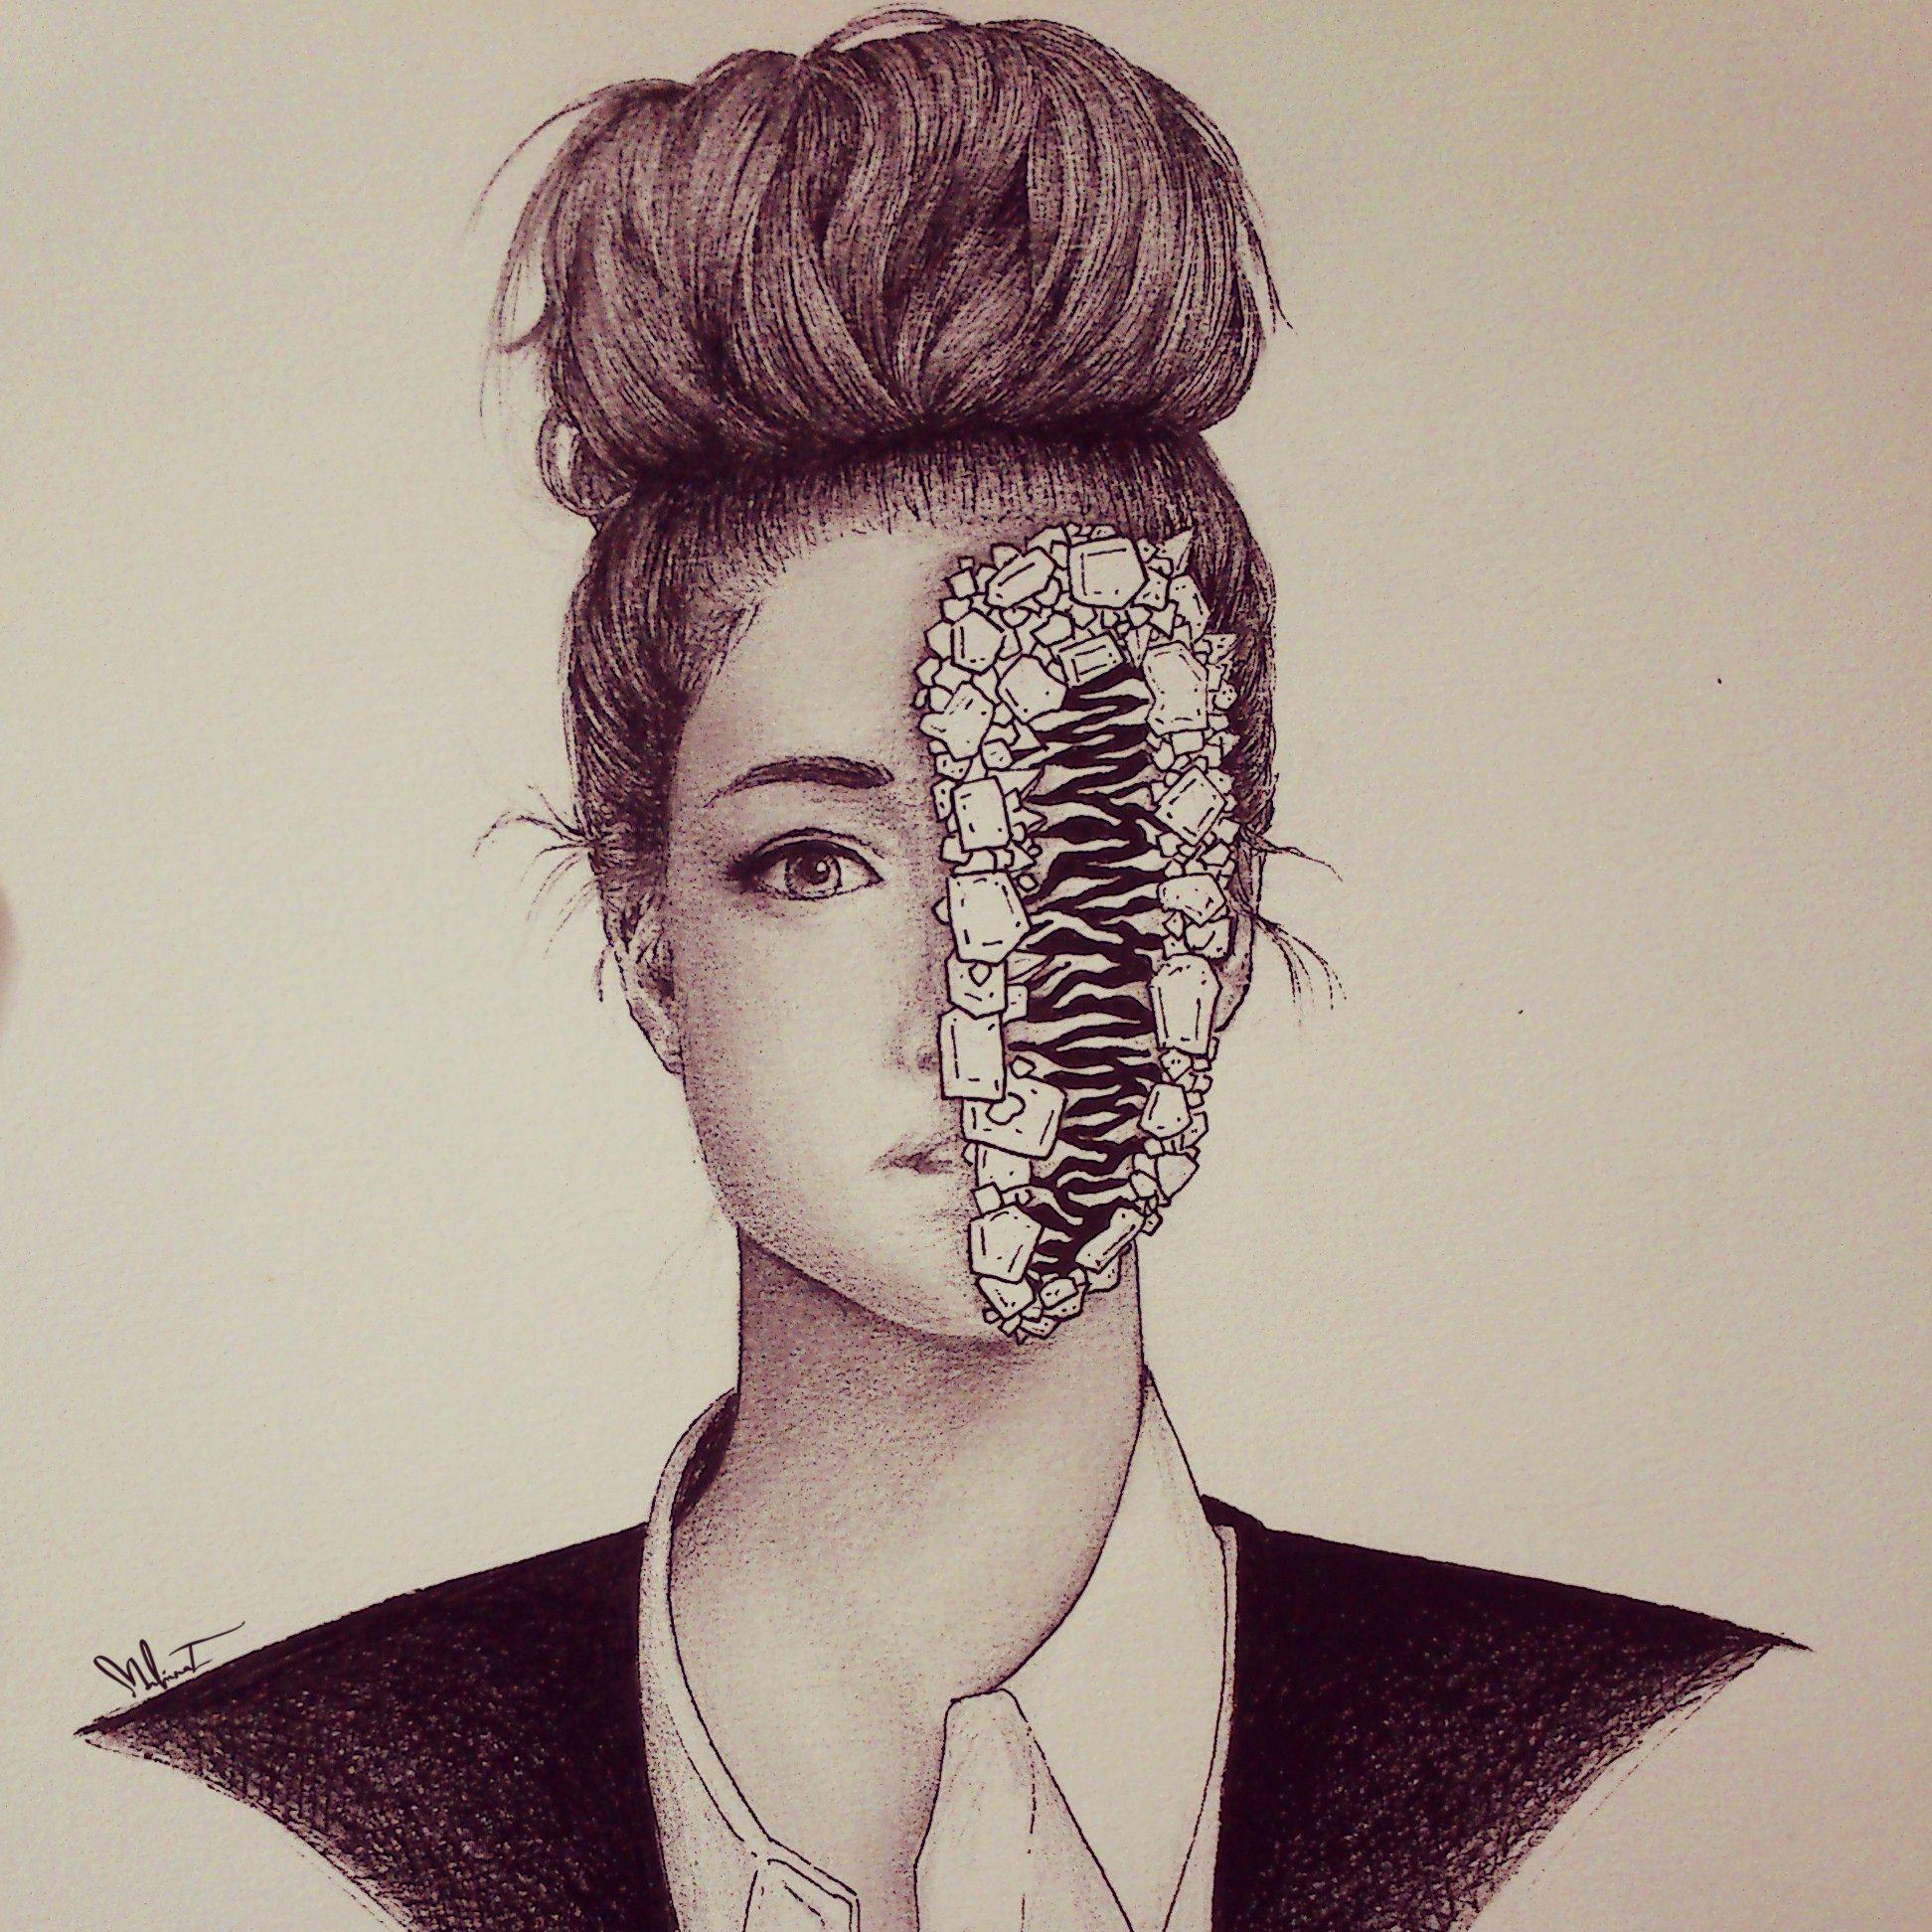 Line Drawing Hair : Messy bun drawing by mahinaz soliman my artworks